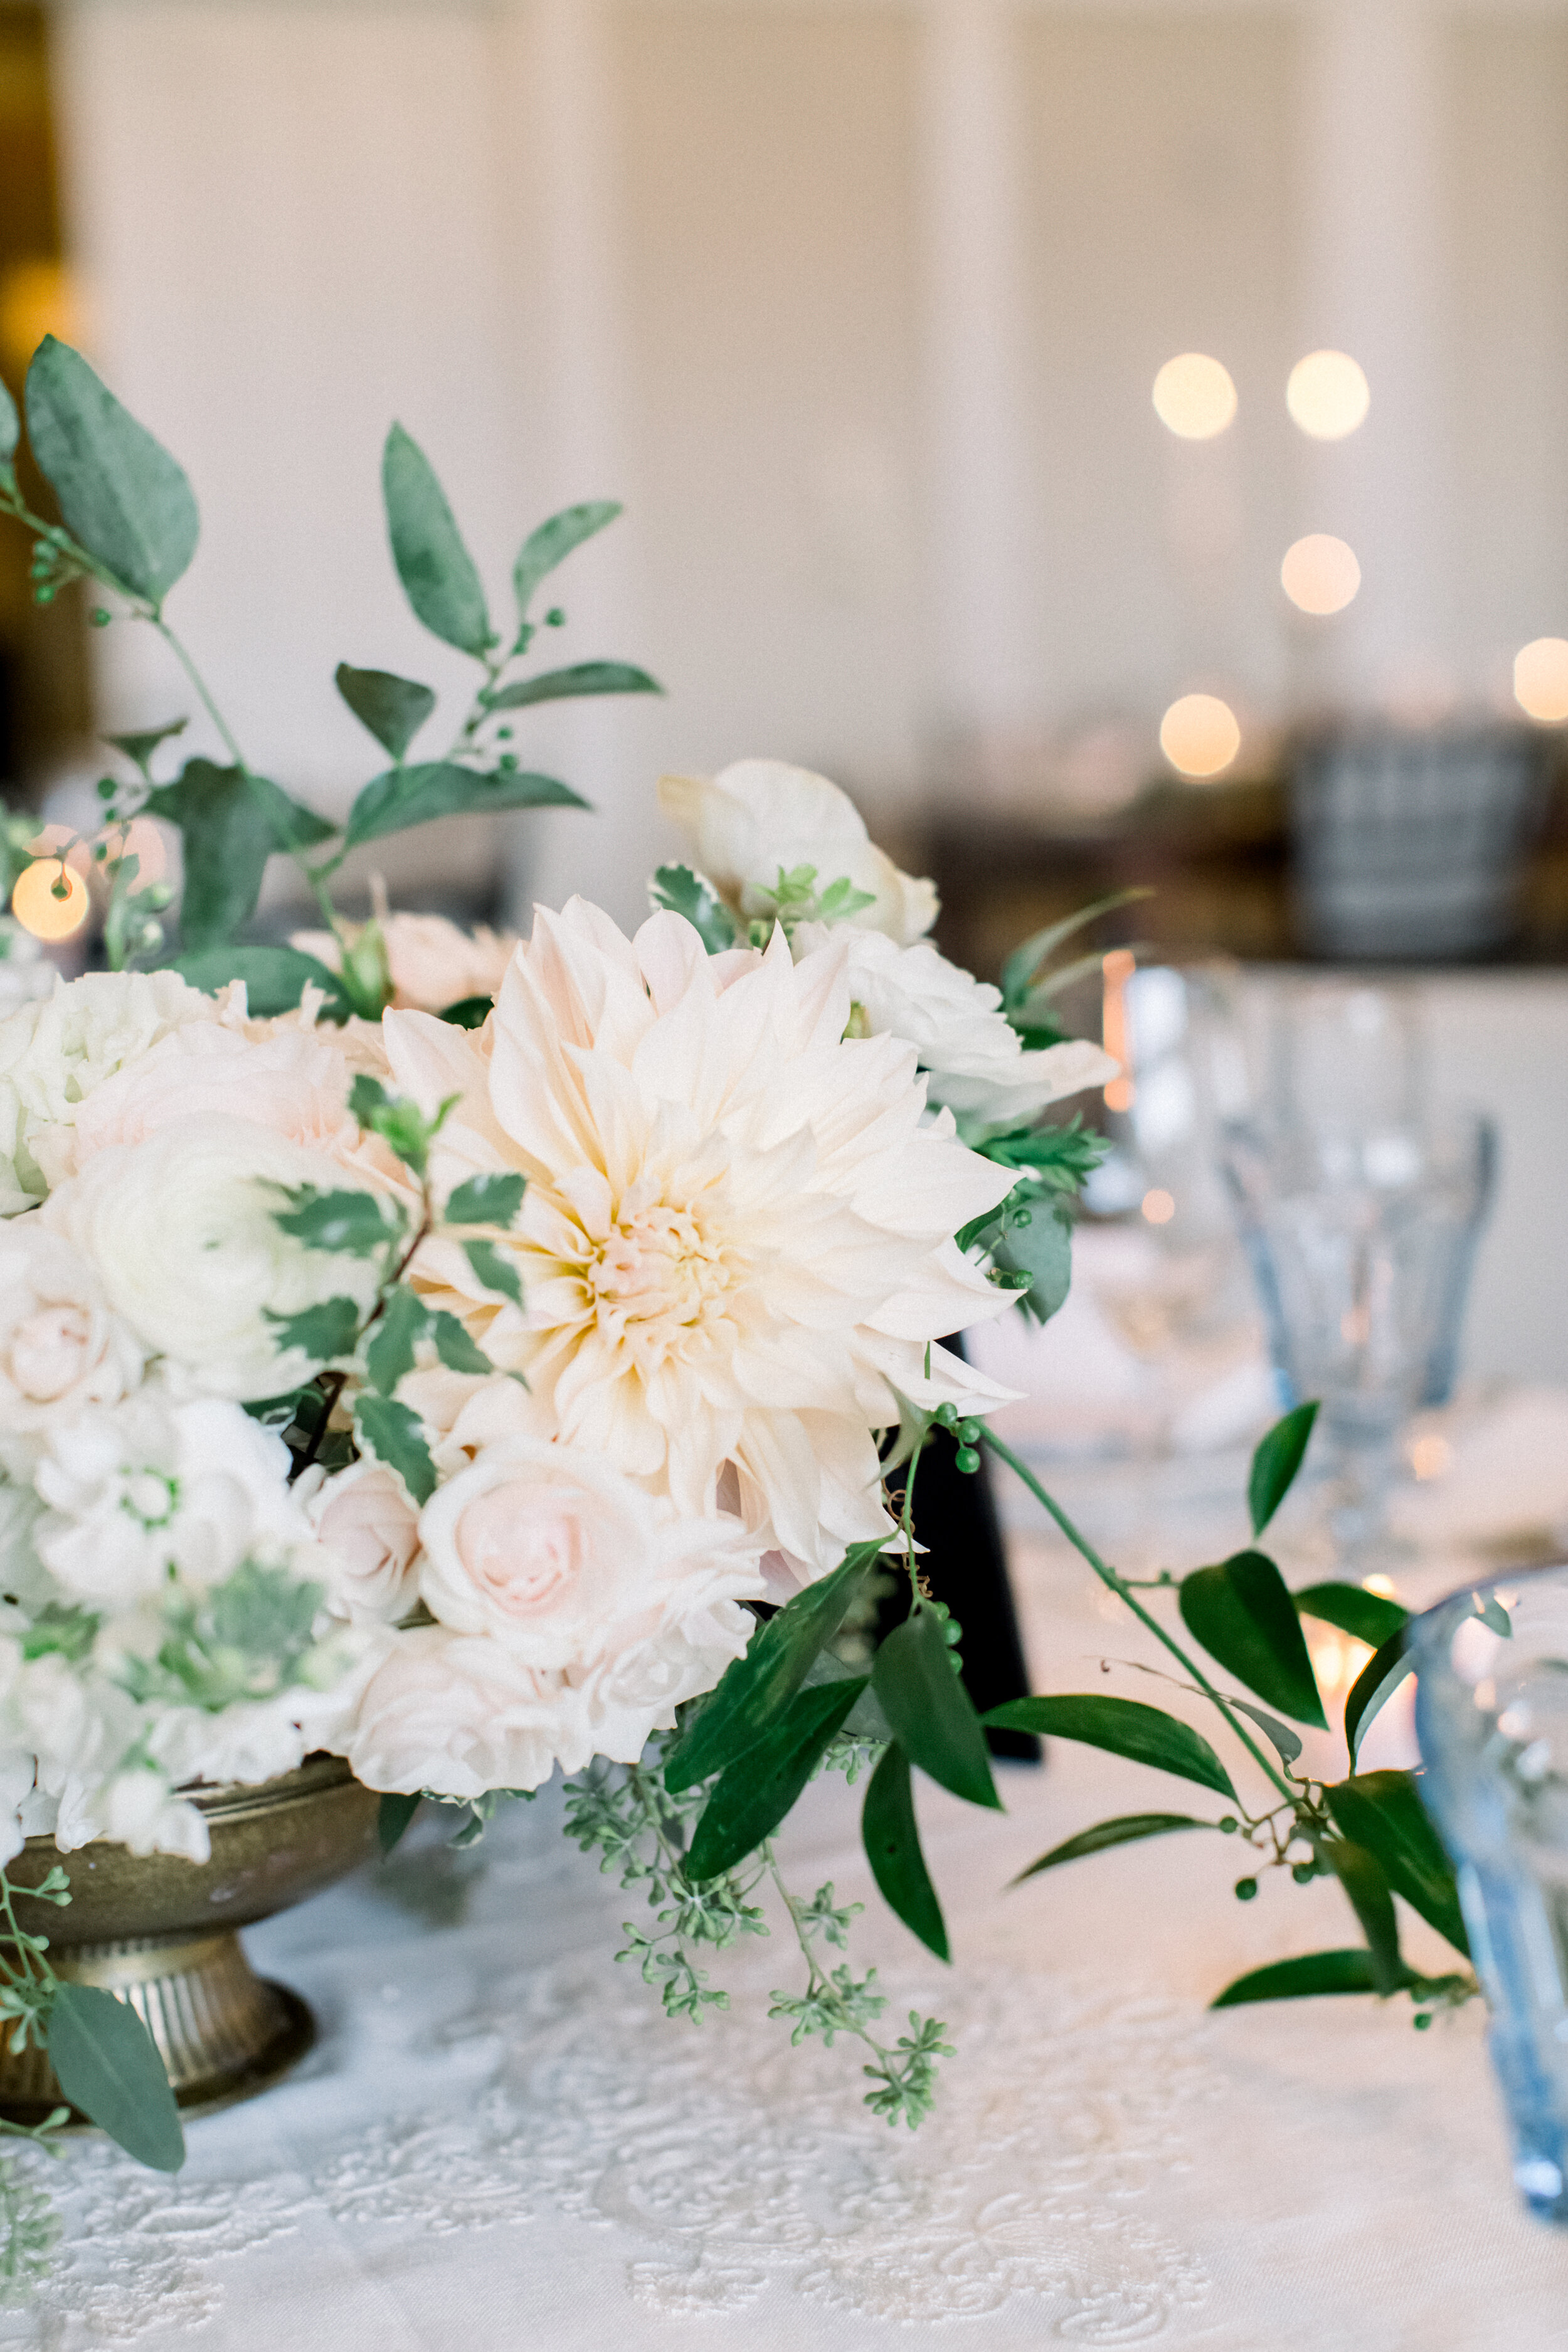 Kuiper+Wedding+Reception+Details-15.jpg